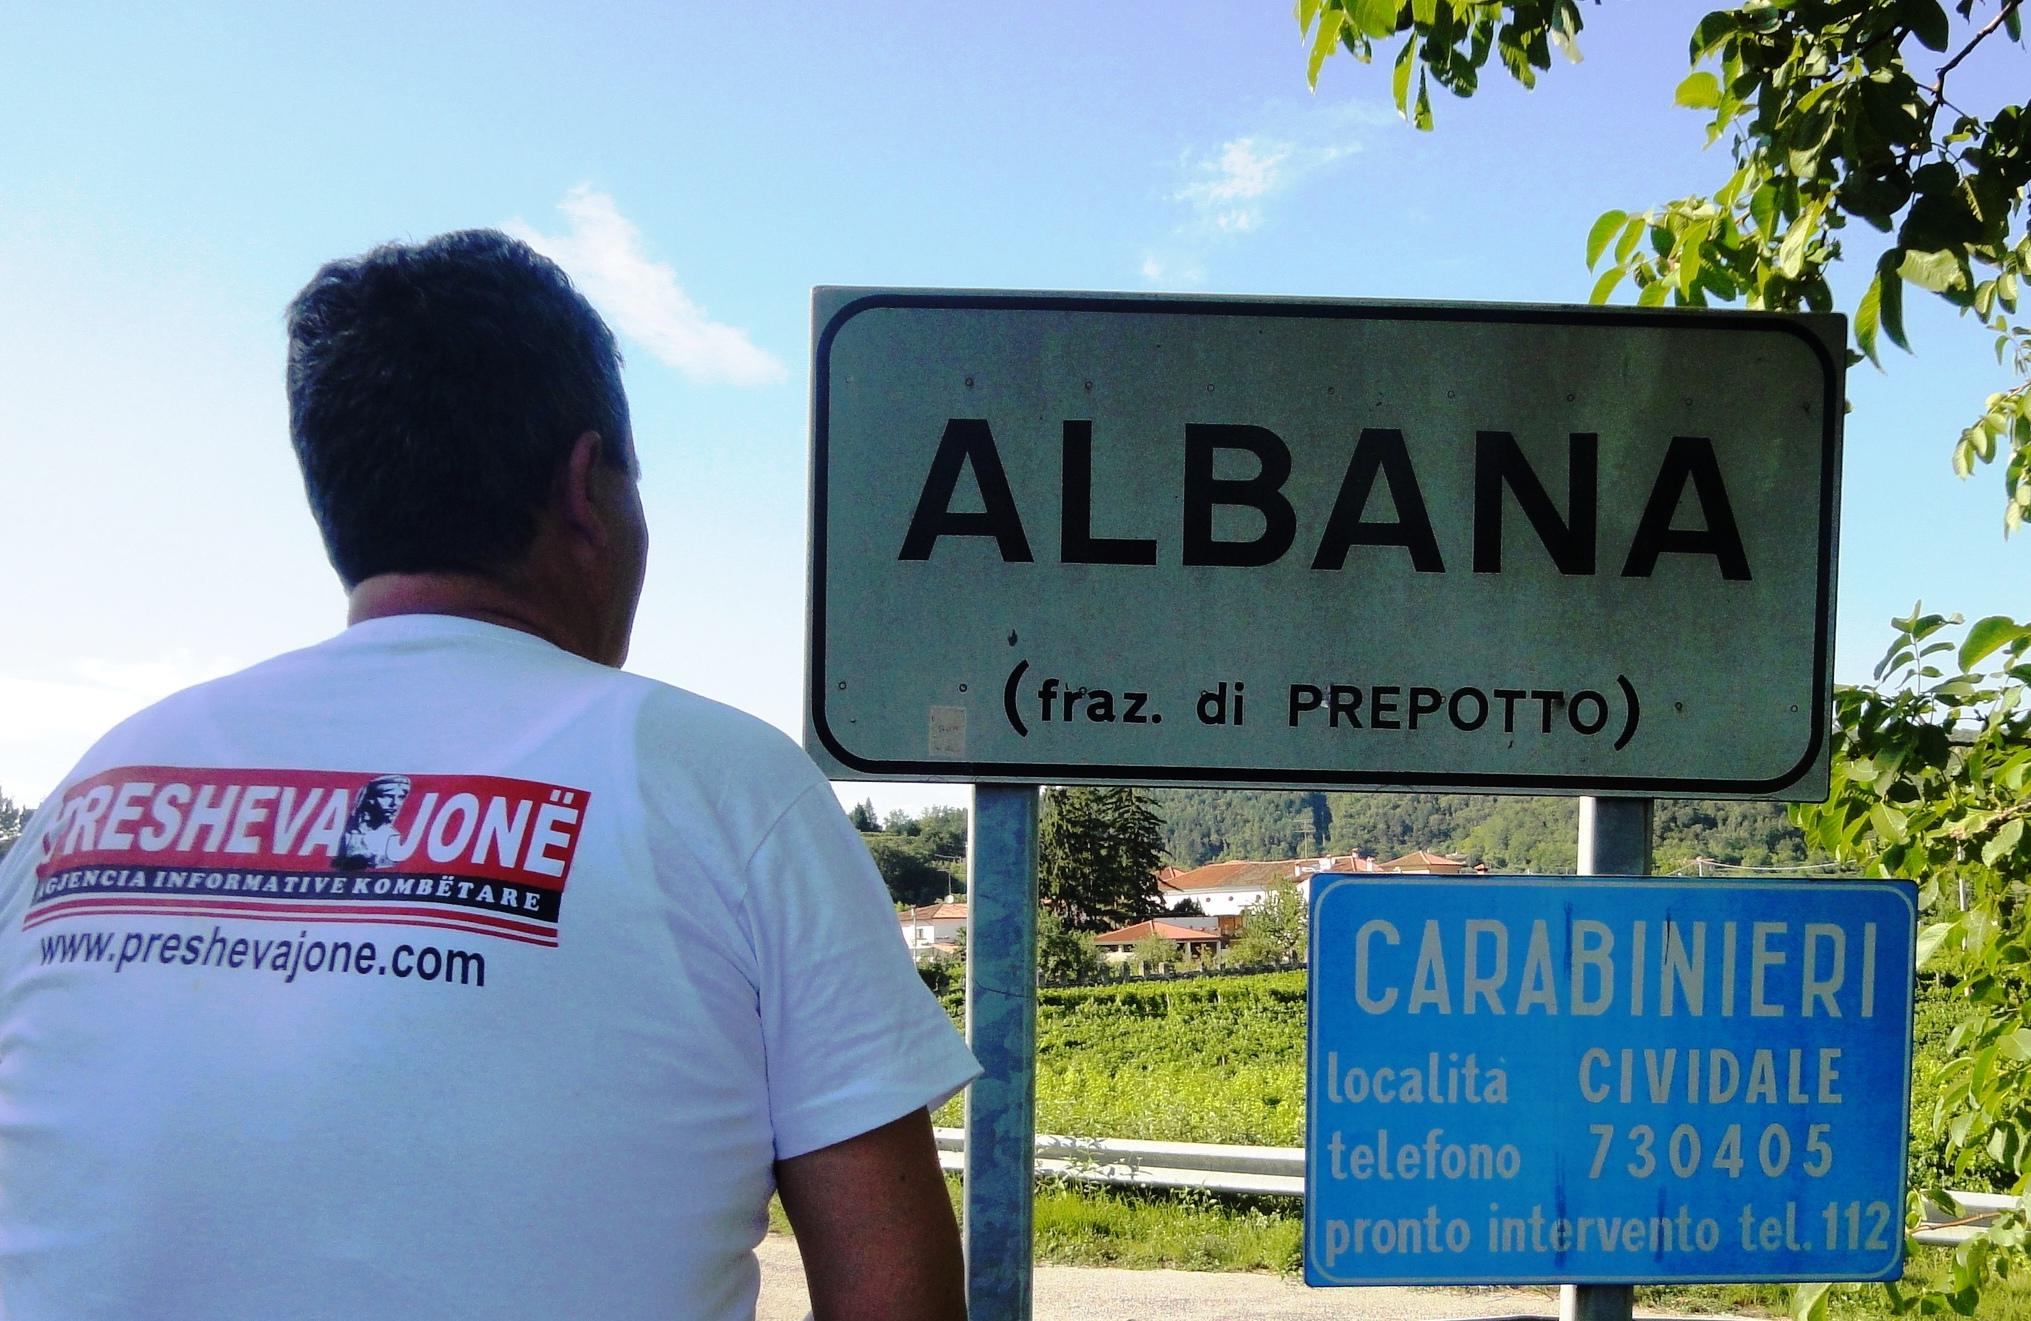 albanaa1